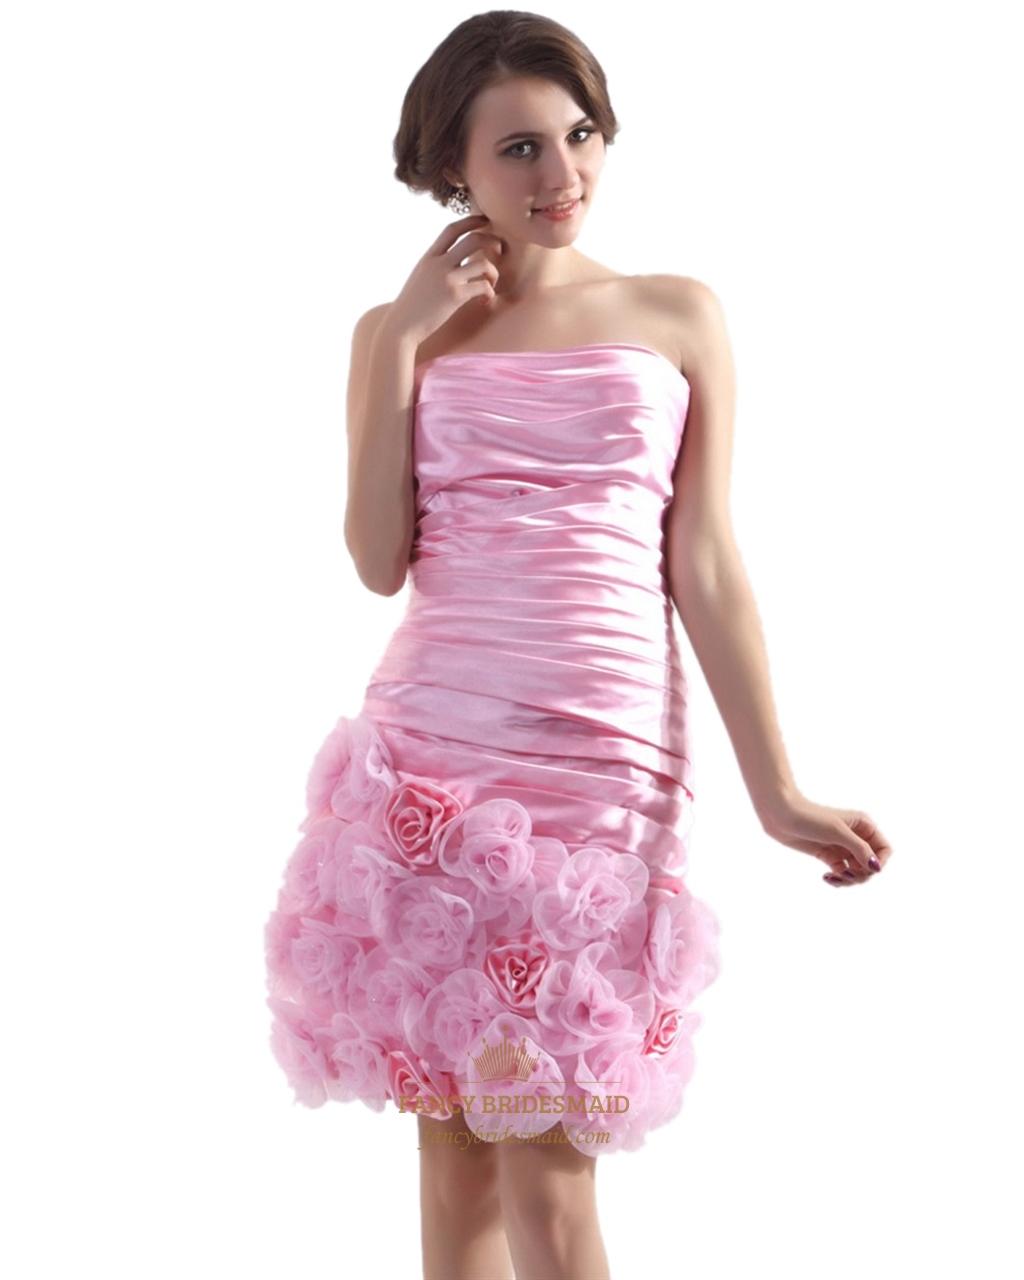 c0f6cc8cbf6 Pink Short Strapless Taffeta Ruched Sheath Cocktail Dress With Rosette SKU  -NW812